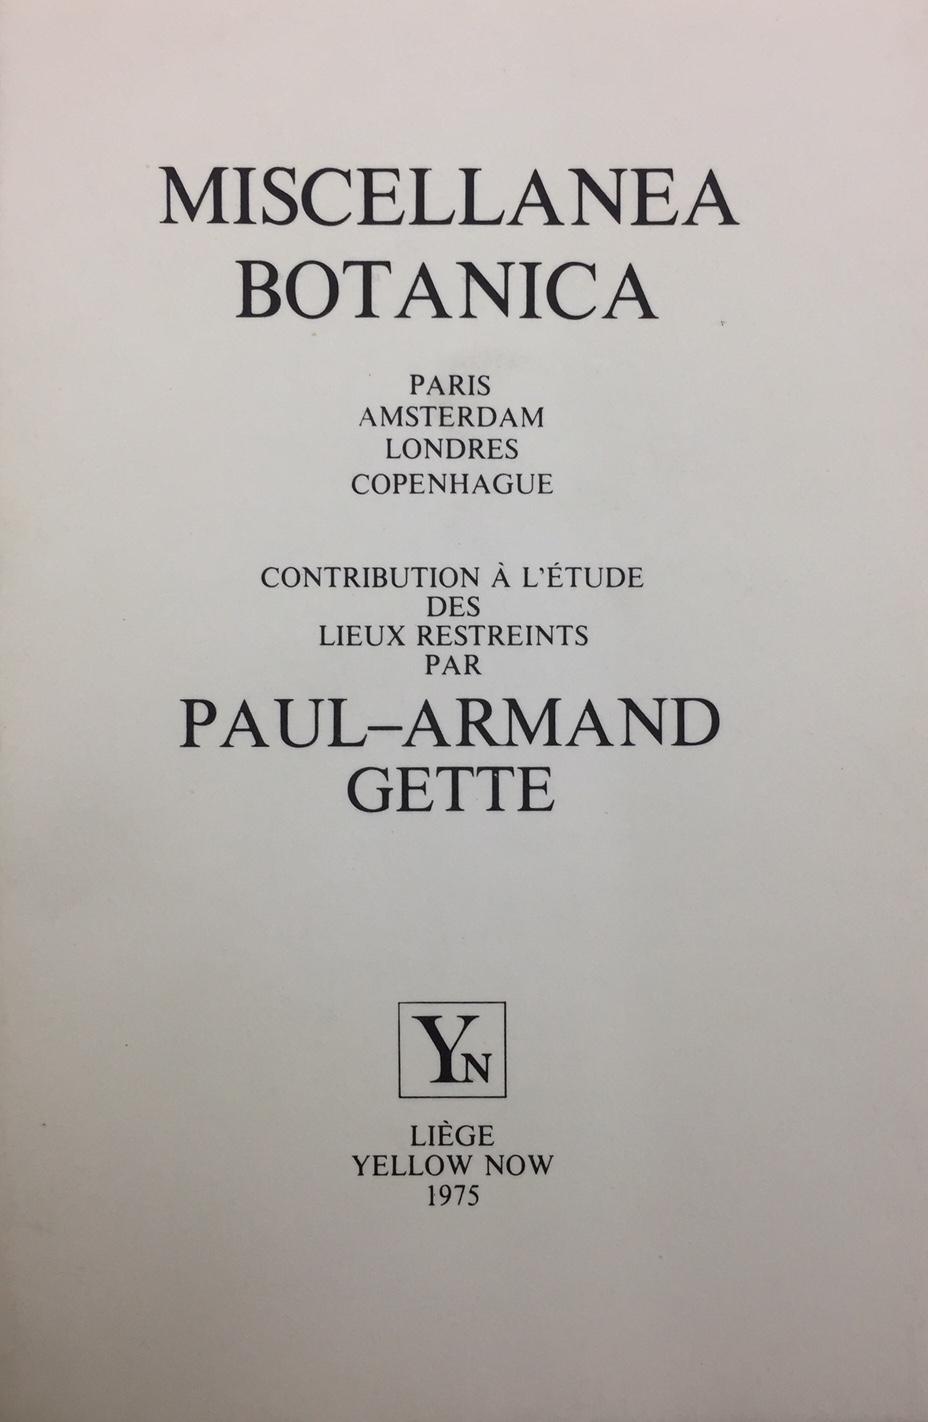 Miscellanea botanica